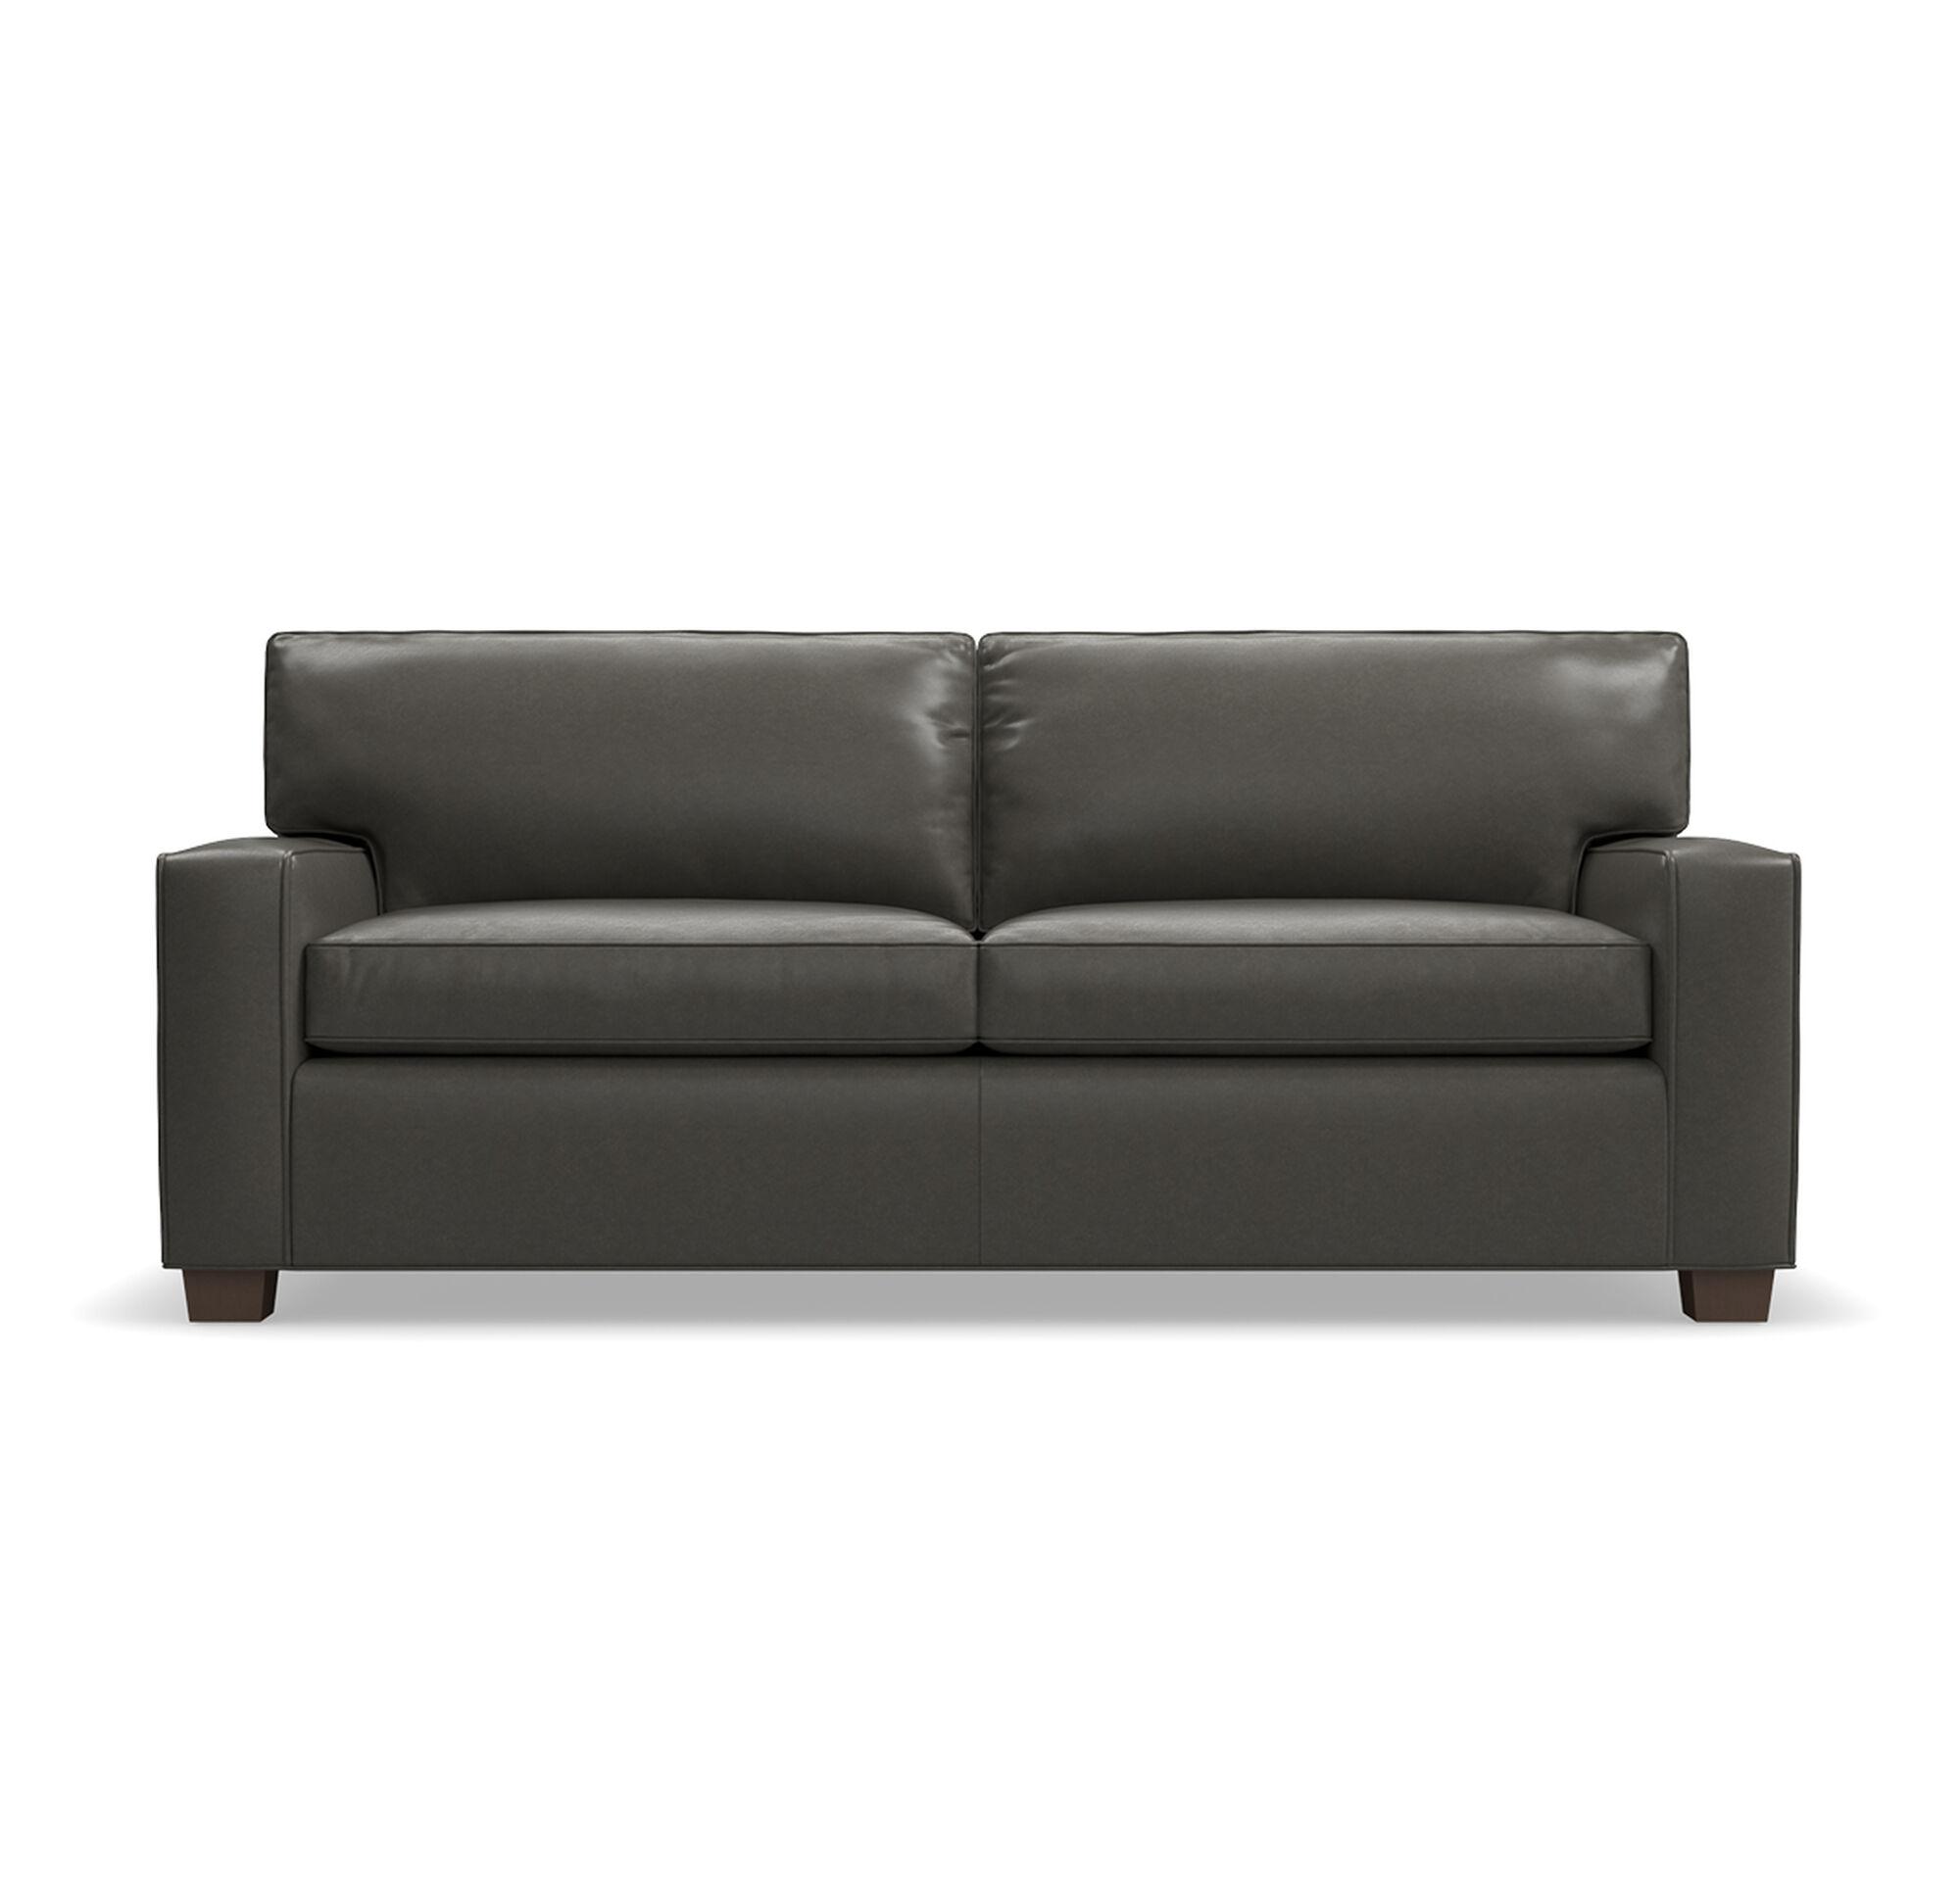 Alex Leather Super Luxe Queen Sleeper Sofa